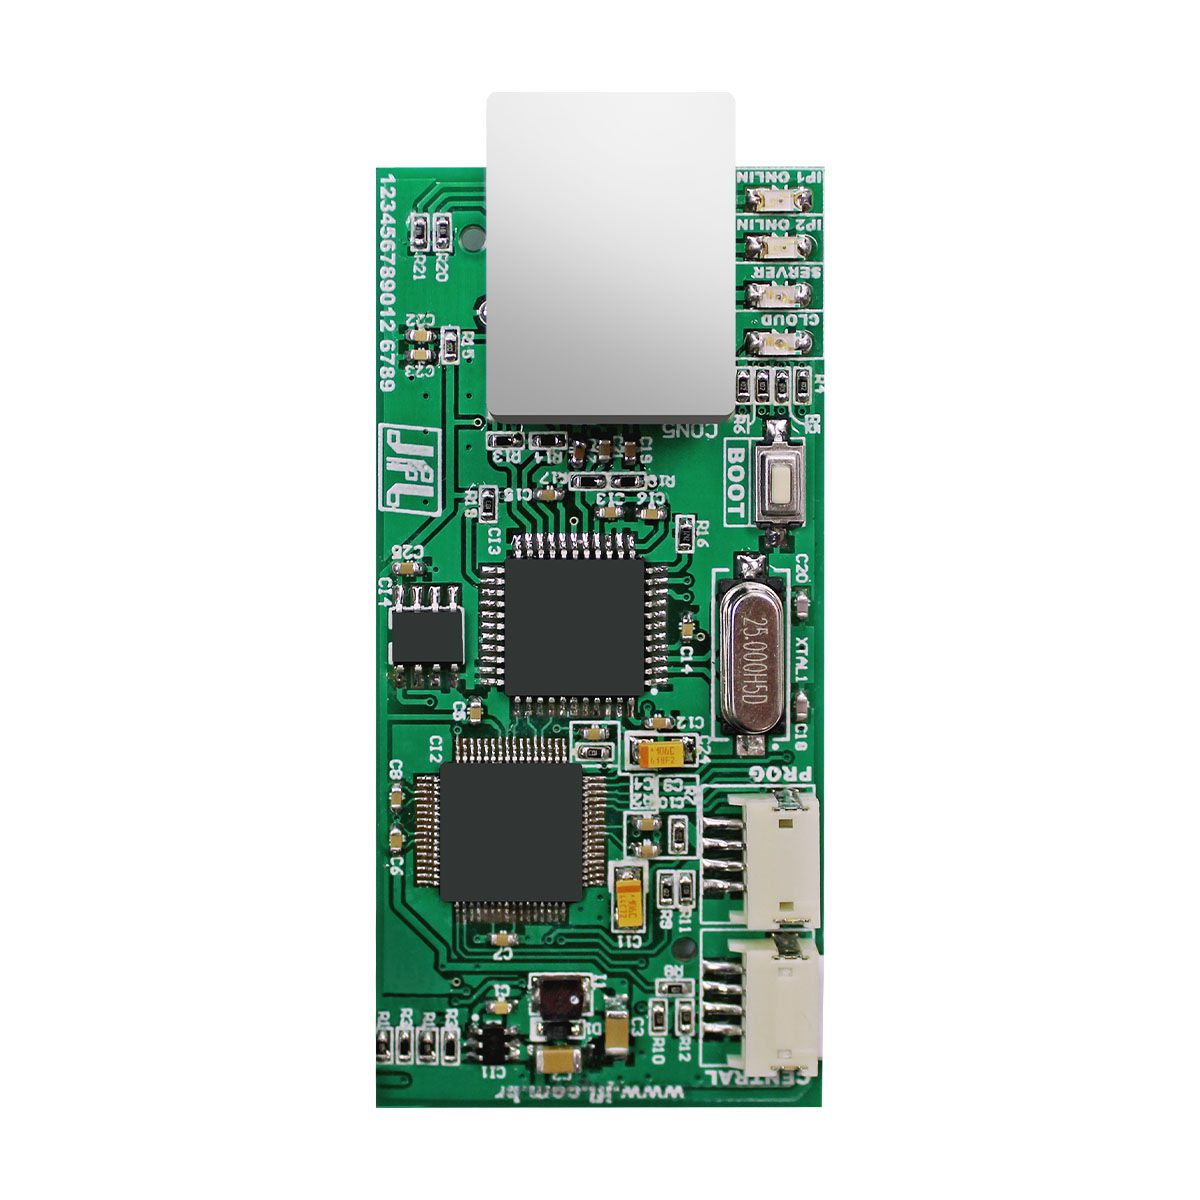 Kit Active 32 Duo Jfl Sem Fio Sensores Sl 220 e 520 Duo S/ Teclado